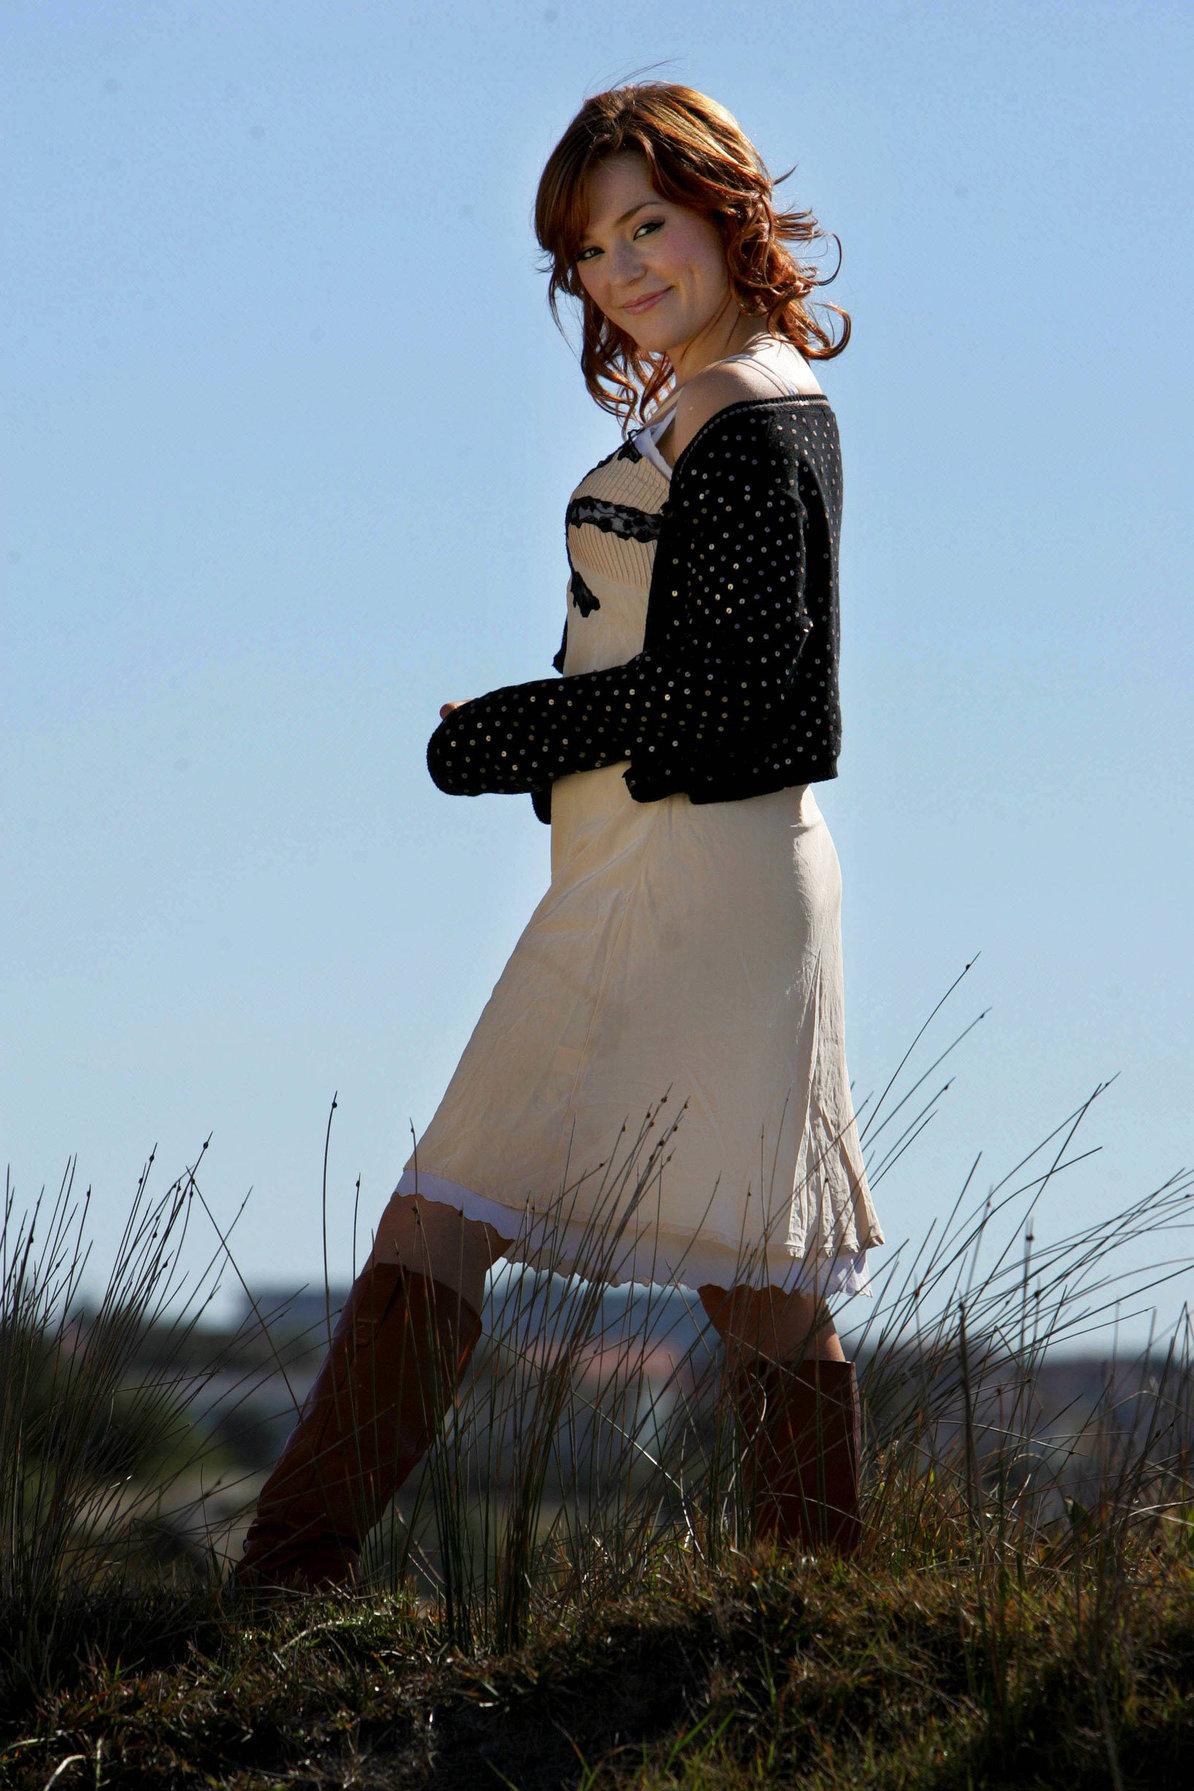 Ella Scott Lynch - Jeff Darmanin Photoshoot